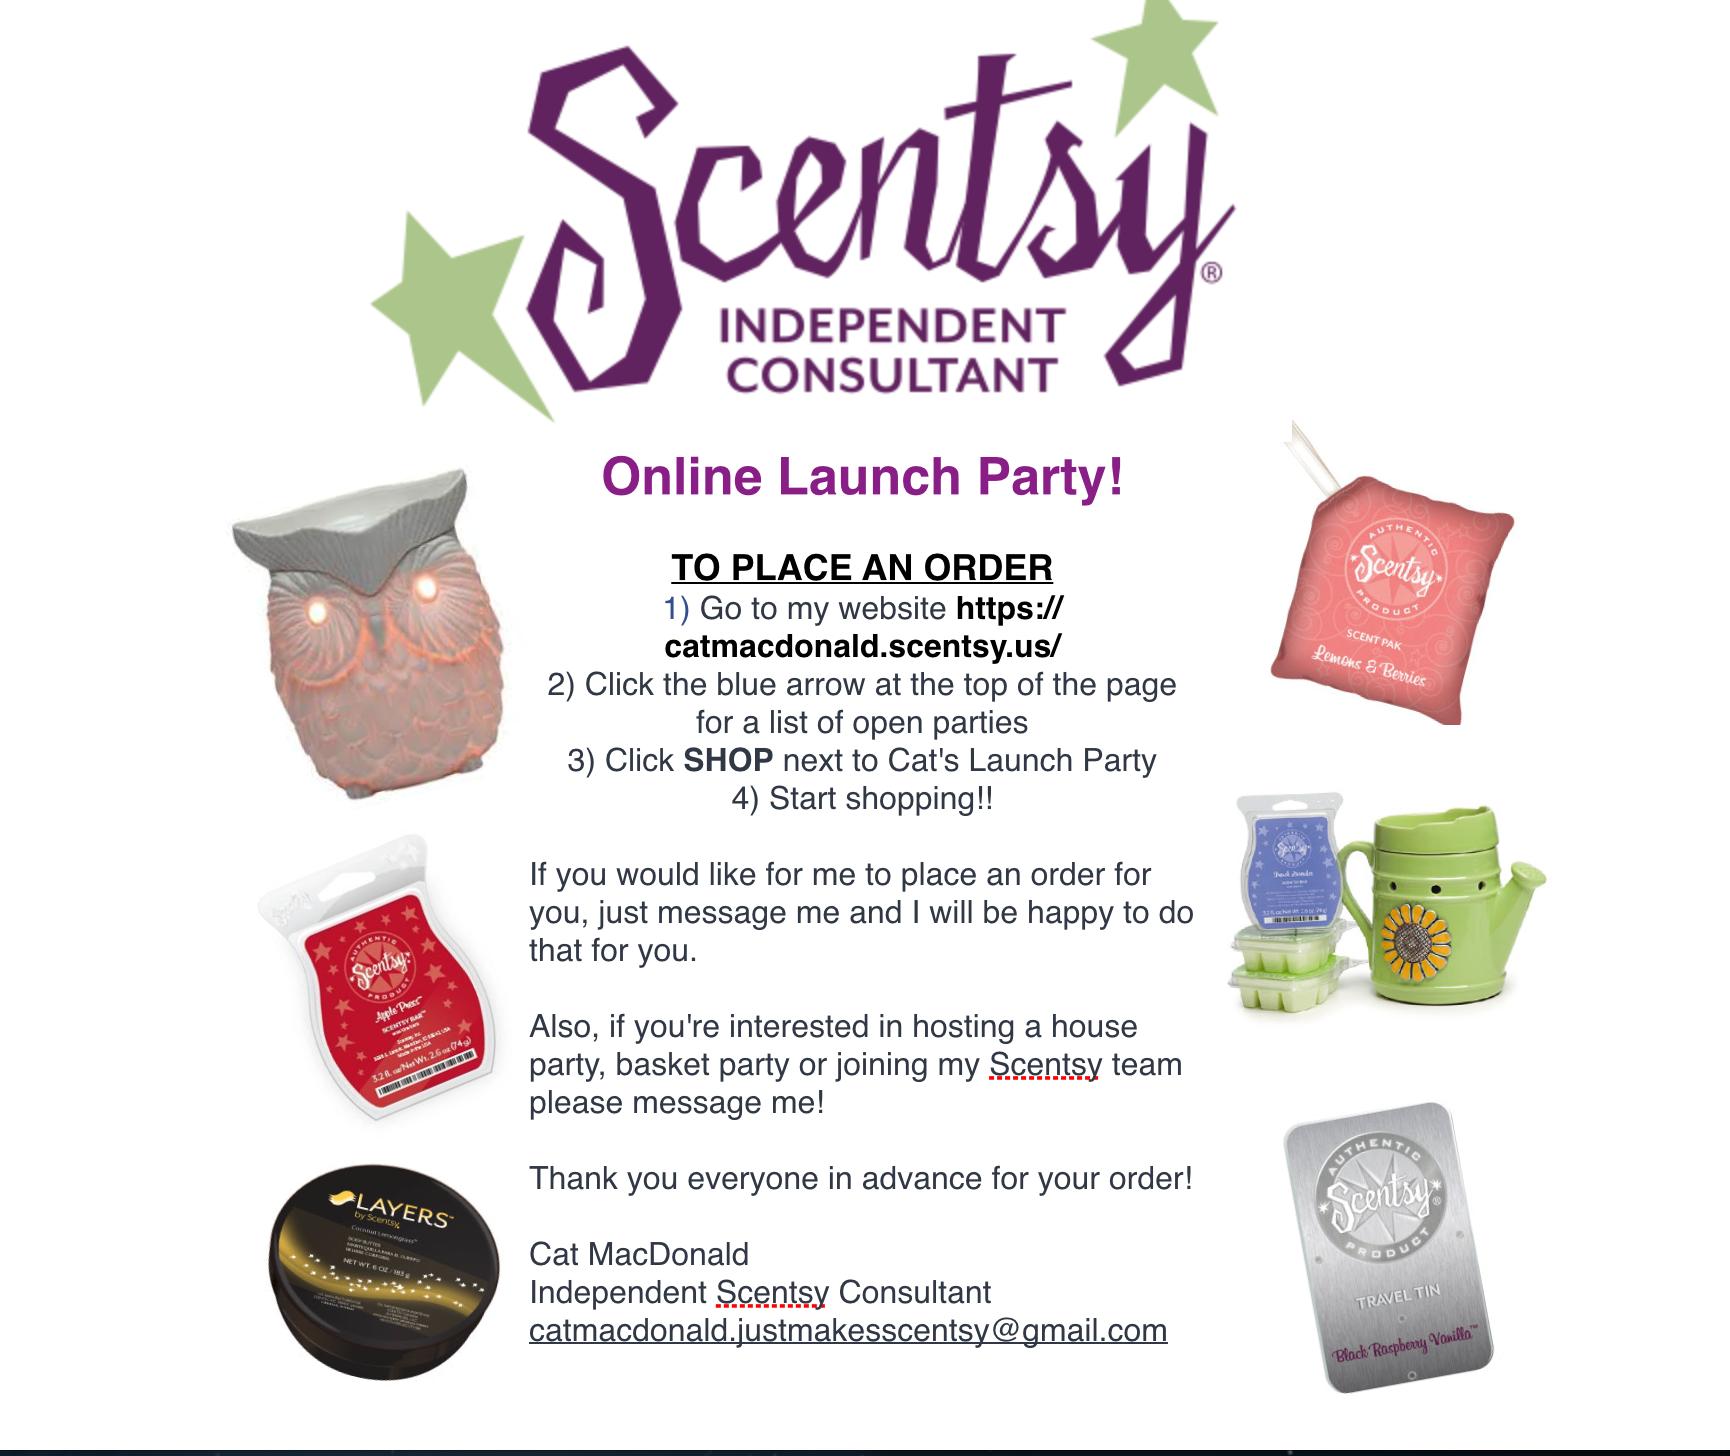 Scentsy Launch Party Invitation Wording | Invitationjpg.com